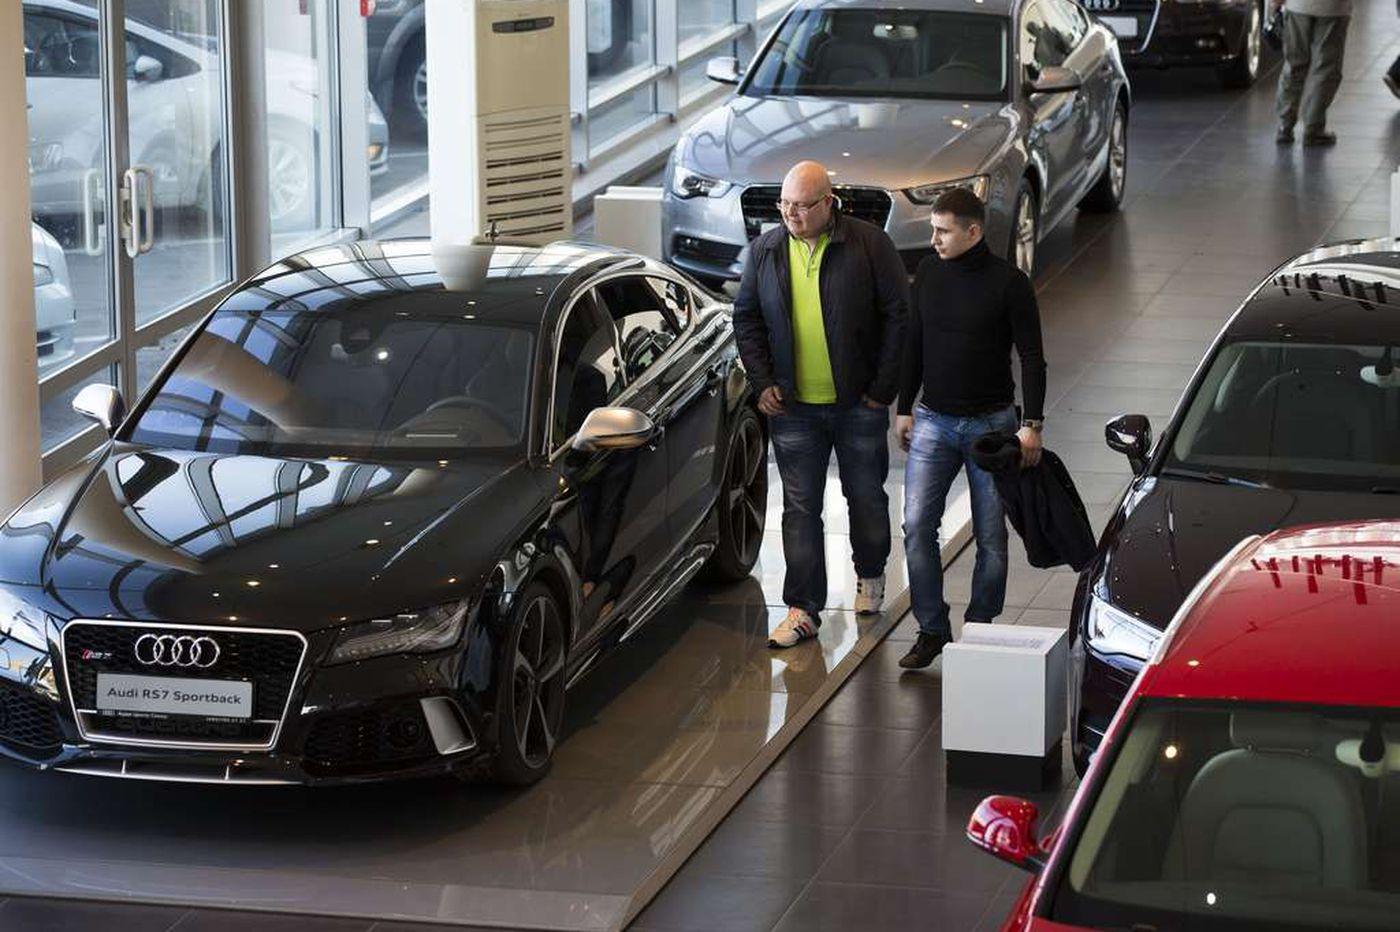 Russian economy puts big dent in auto sales